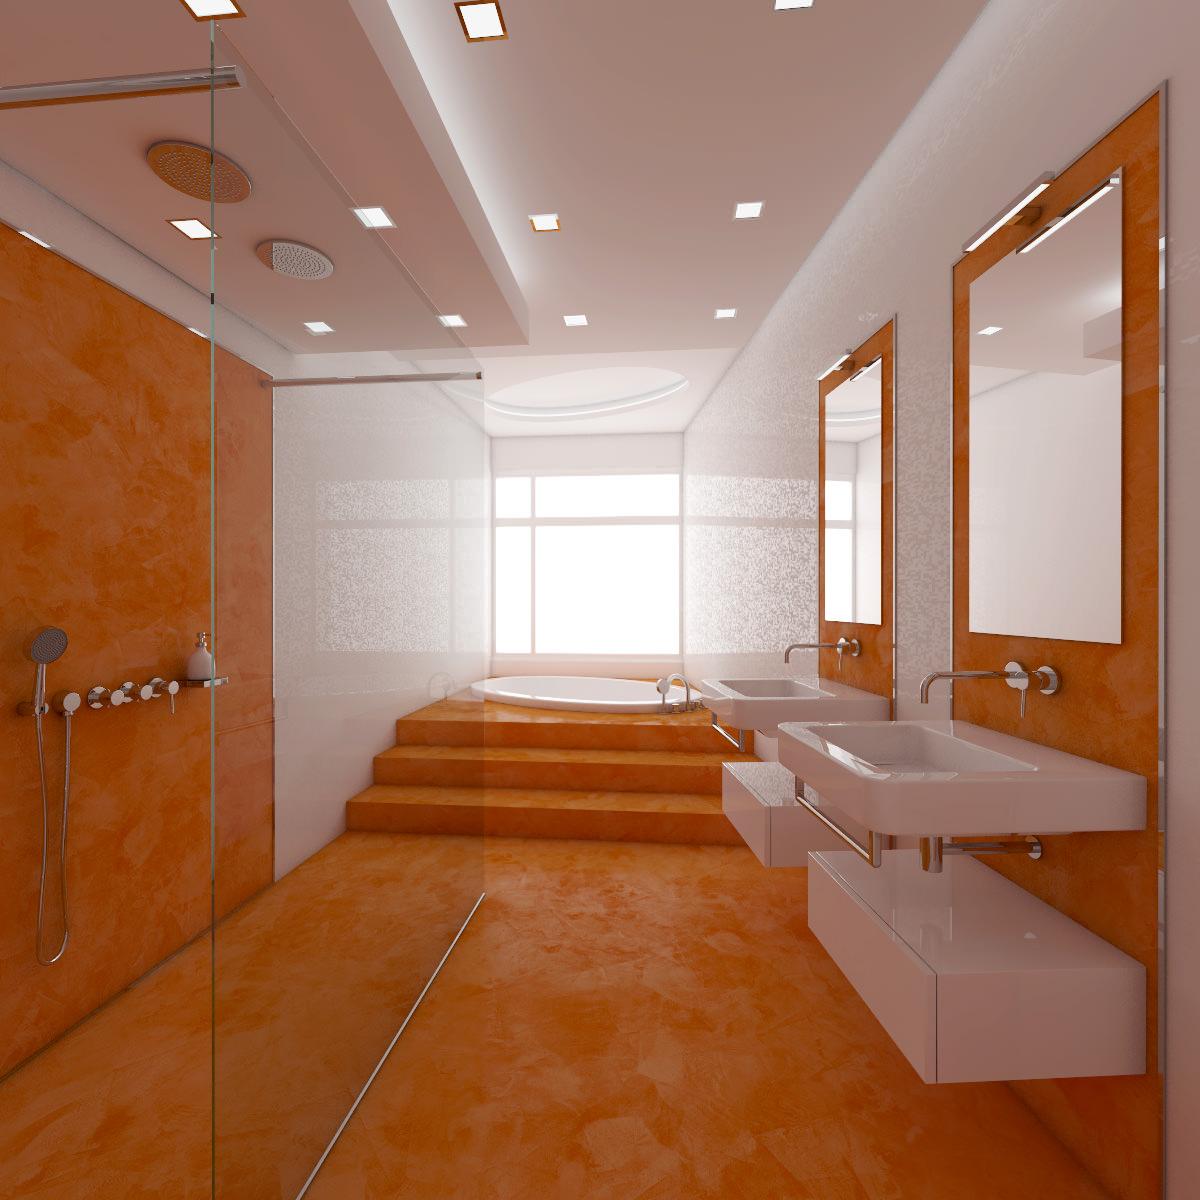 Ванная комната оранжевого цвета фото